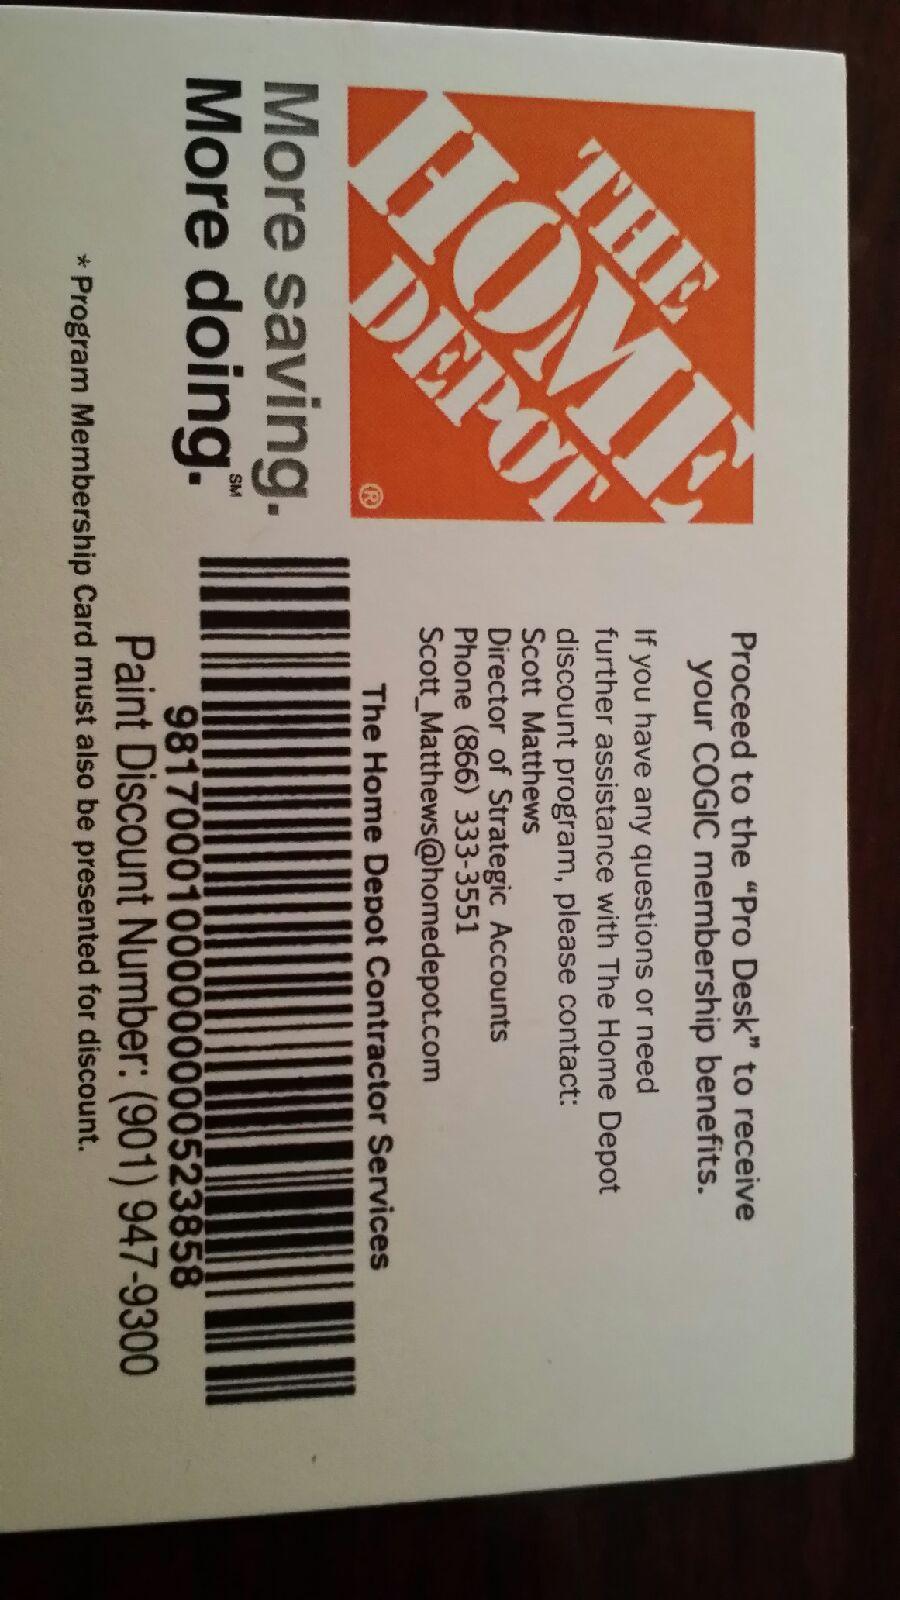 The Home Depot Veterans Discount Program